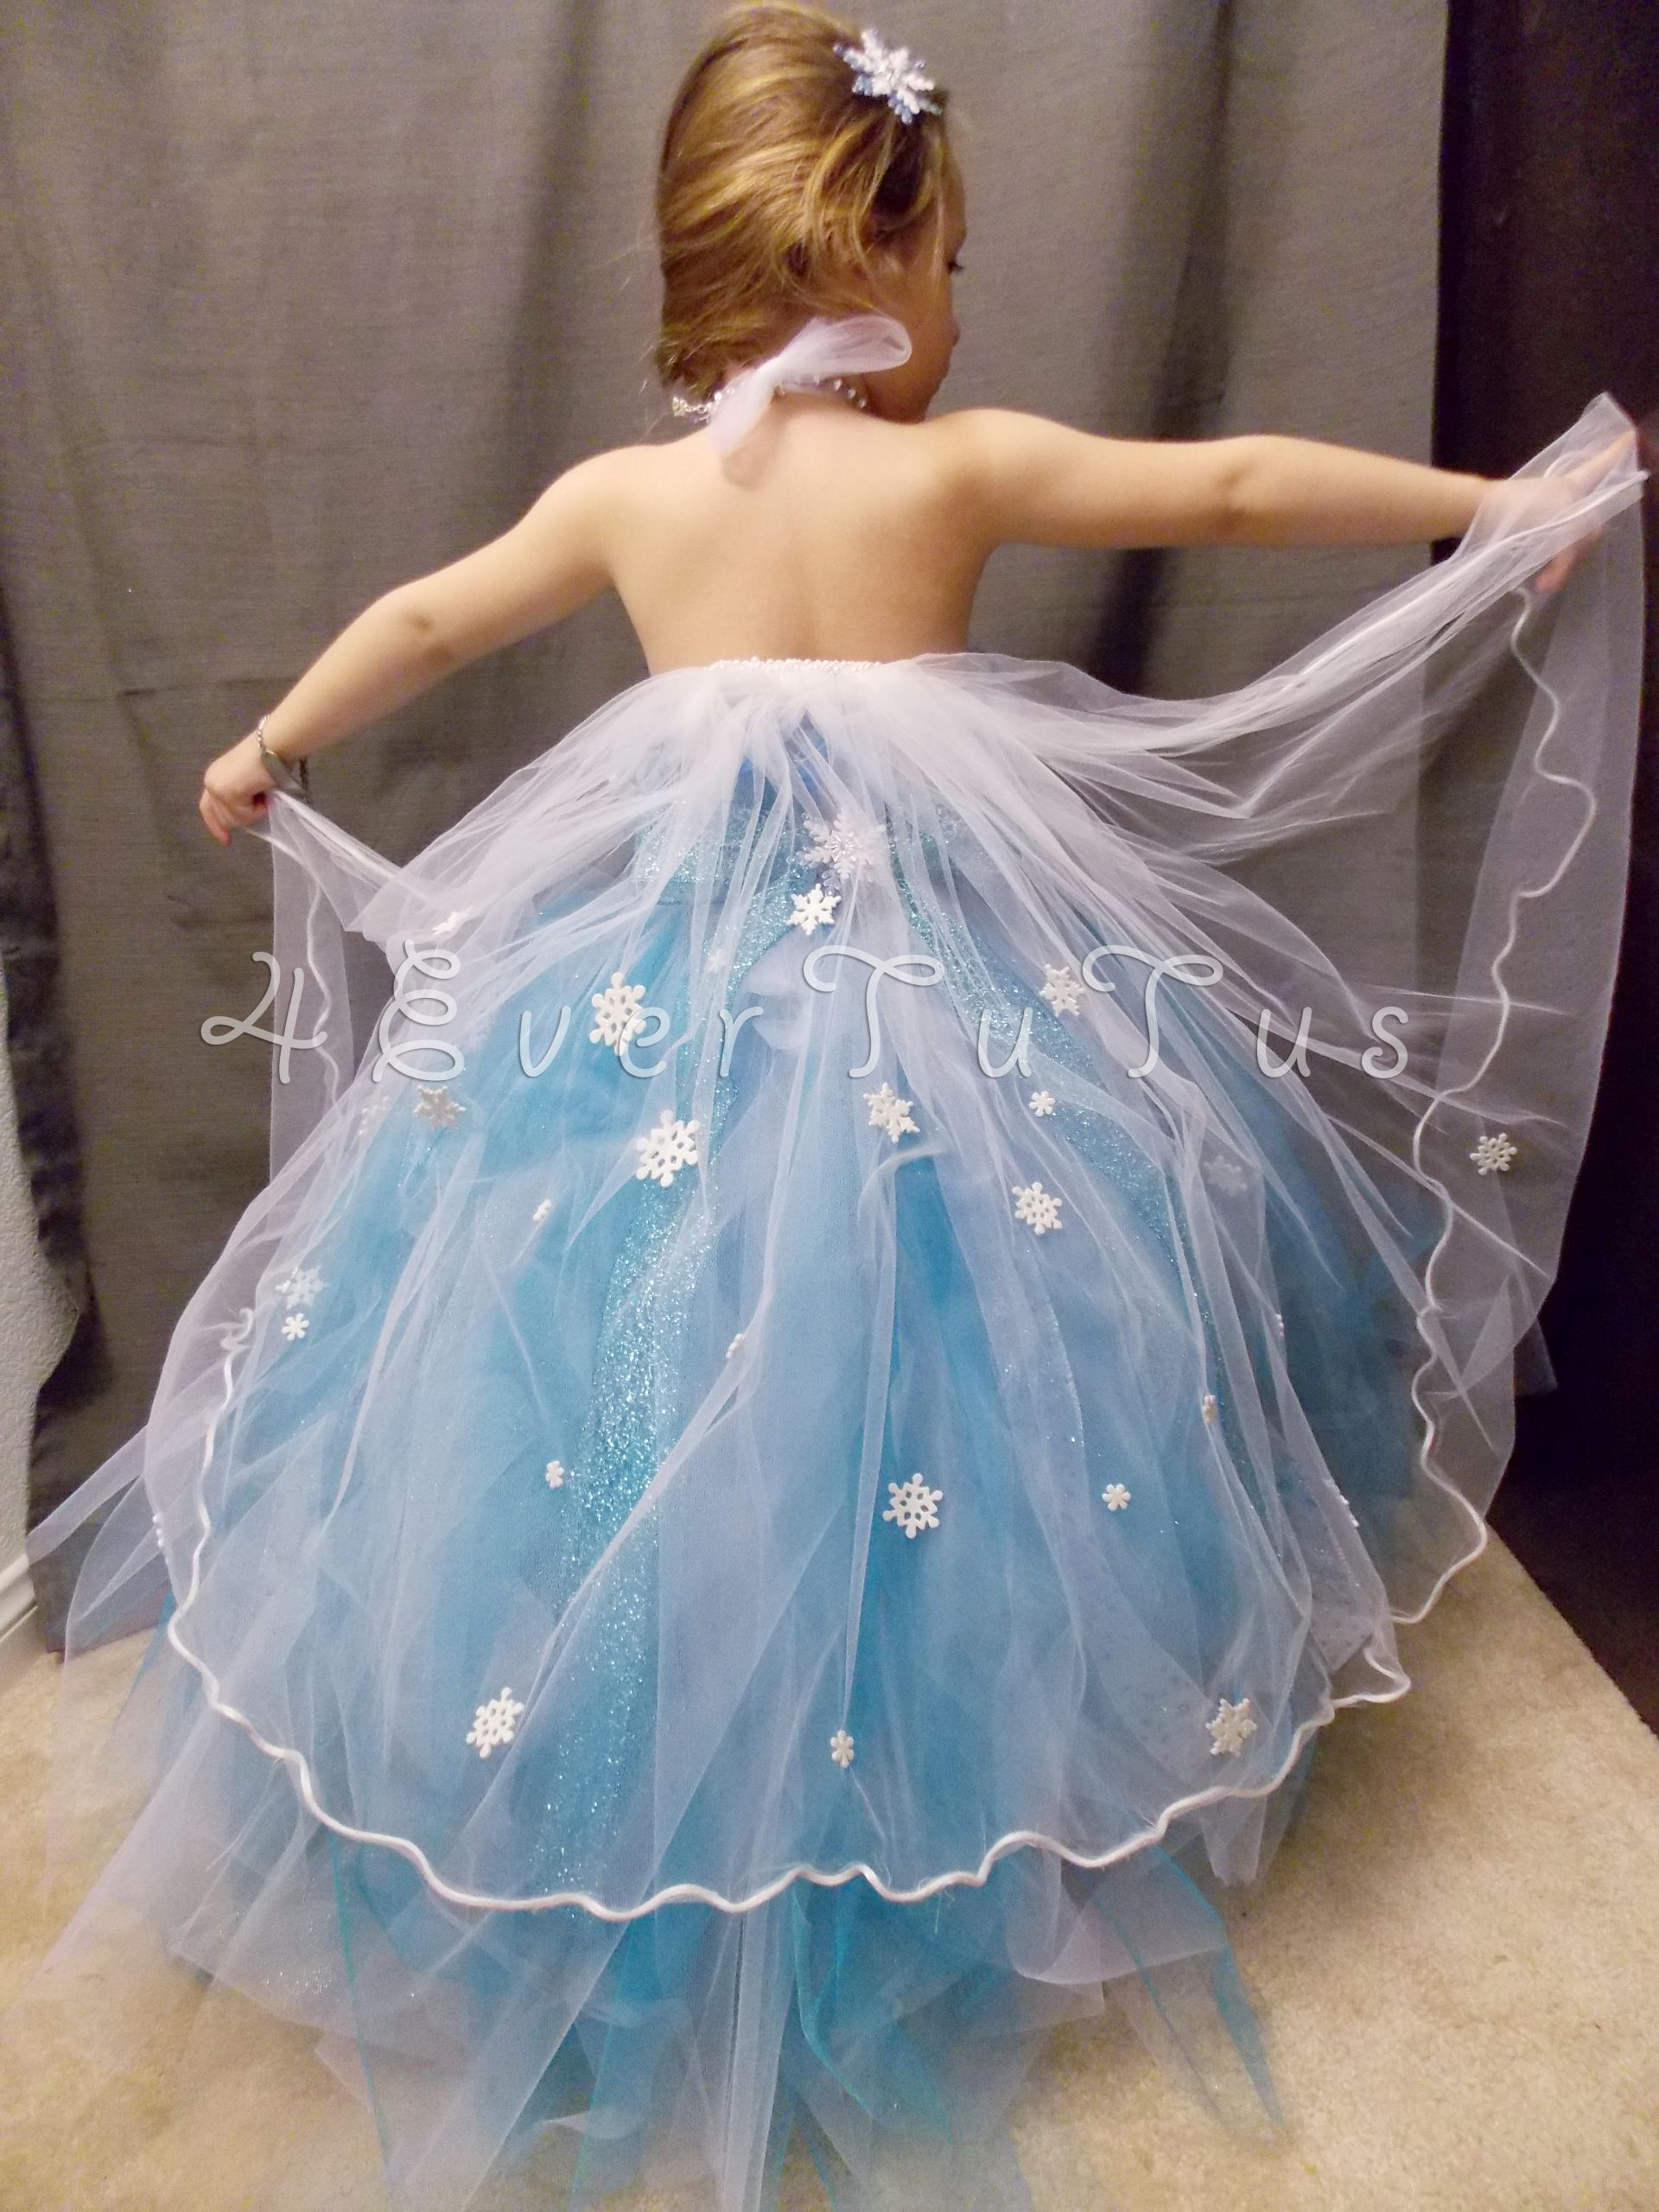 frozen tutu dress - Google Search | Tutu Costumes | Pinterest ...